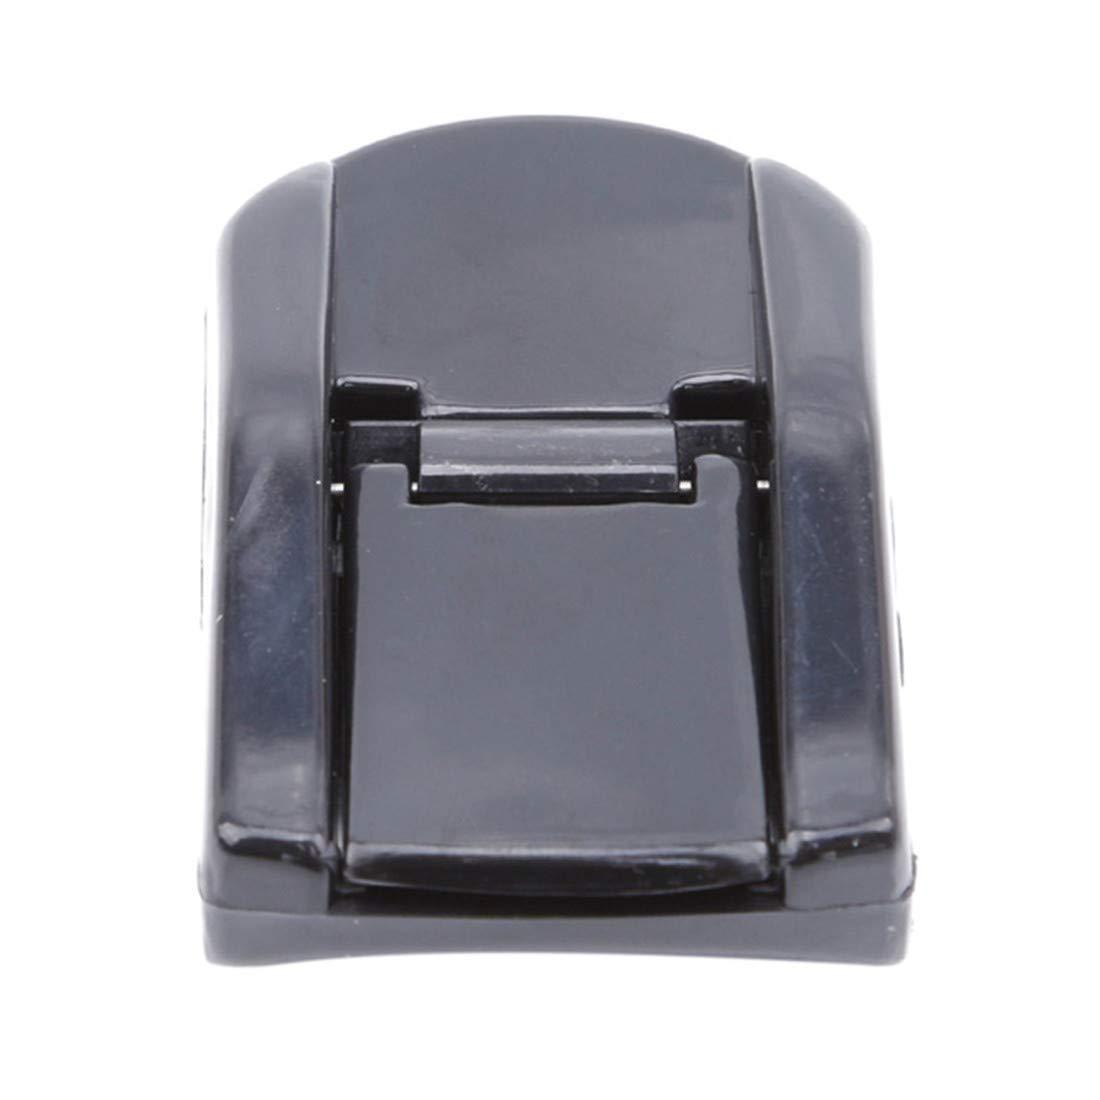 VWH Black Eyelash Curler Portable Plastic Eyelash Curler Curling Natural 3D Fiber Eyelash Applicator Eye Makeup Tool